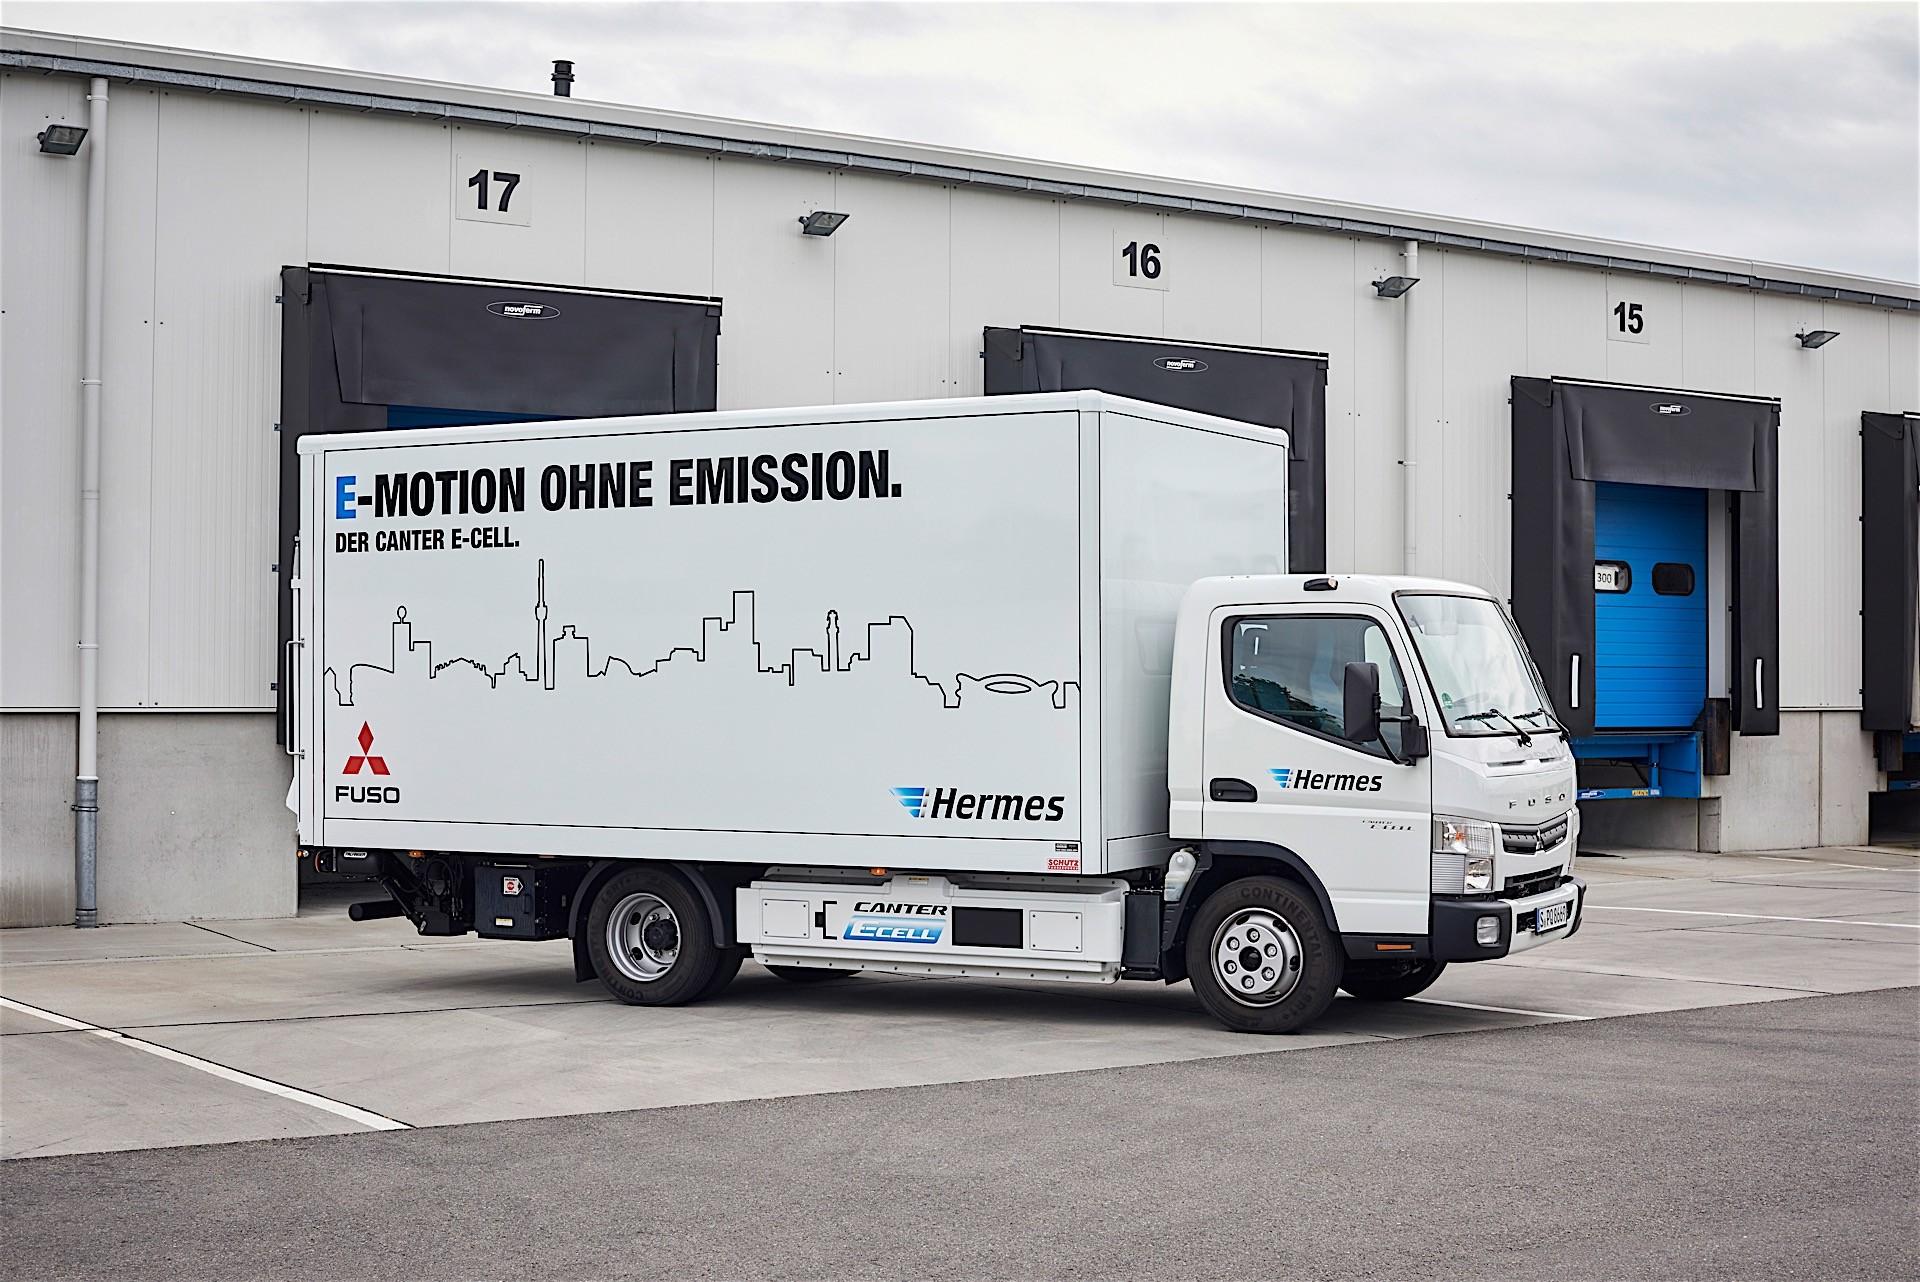 Mercedes benz unveils urban etruck a short range electric for Mercedes benz electric truck